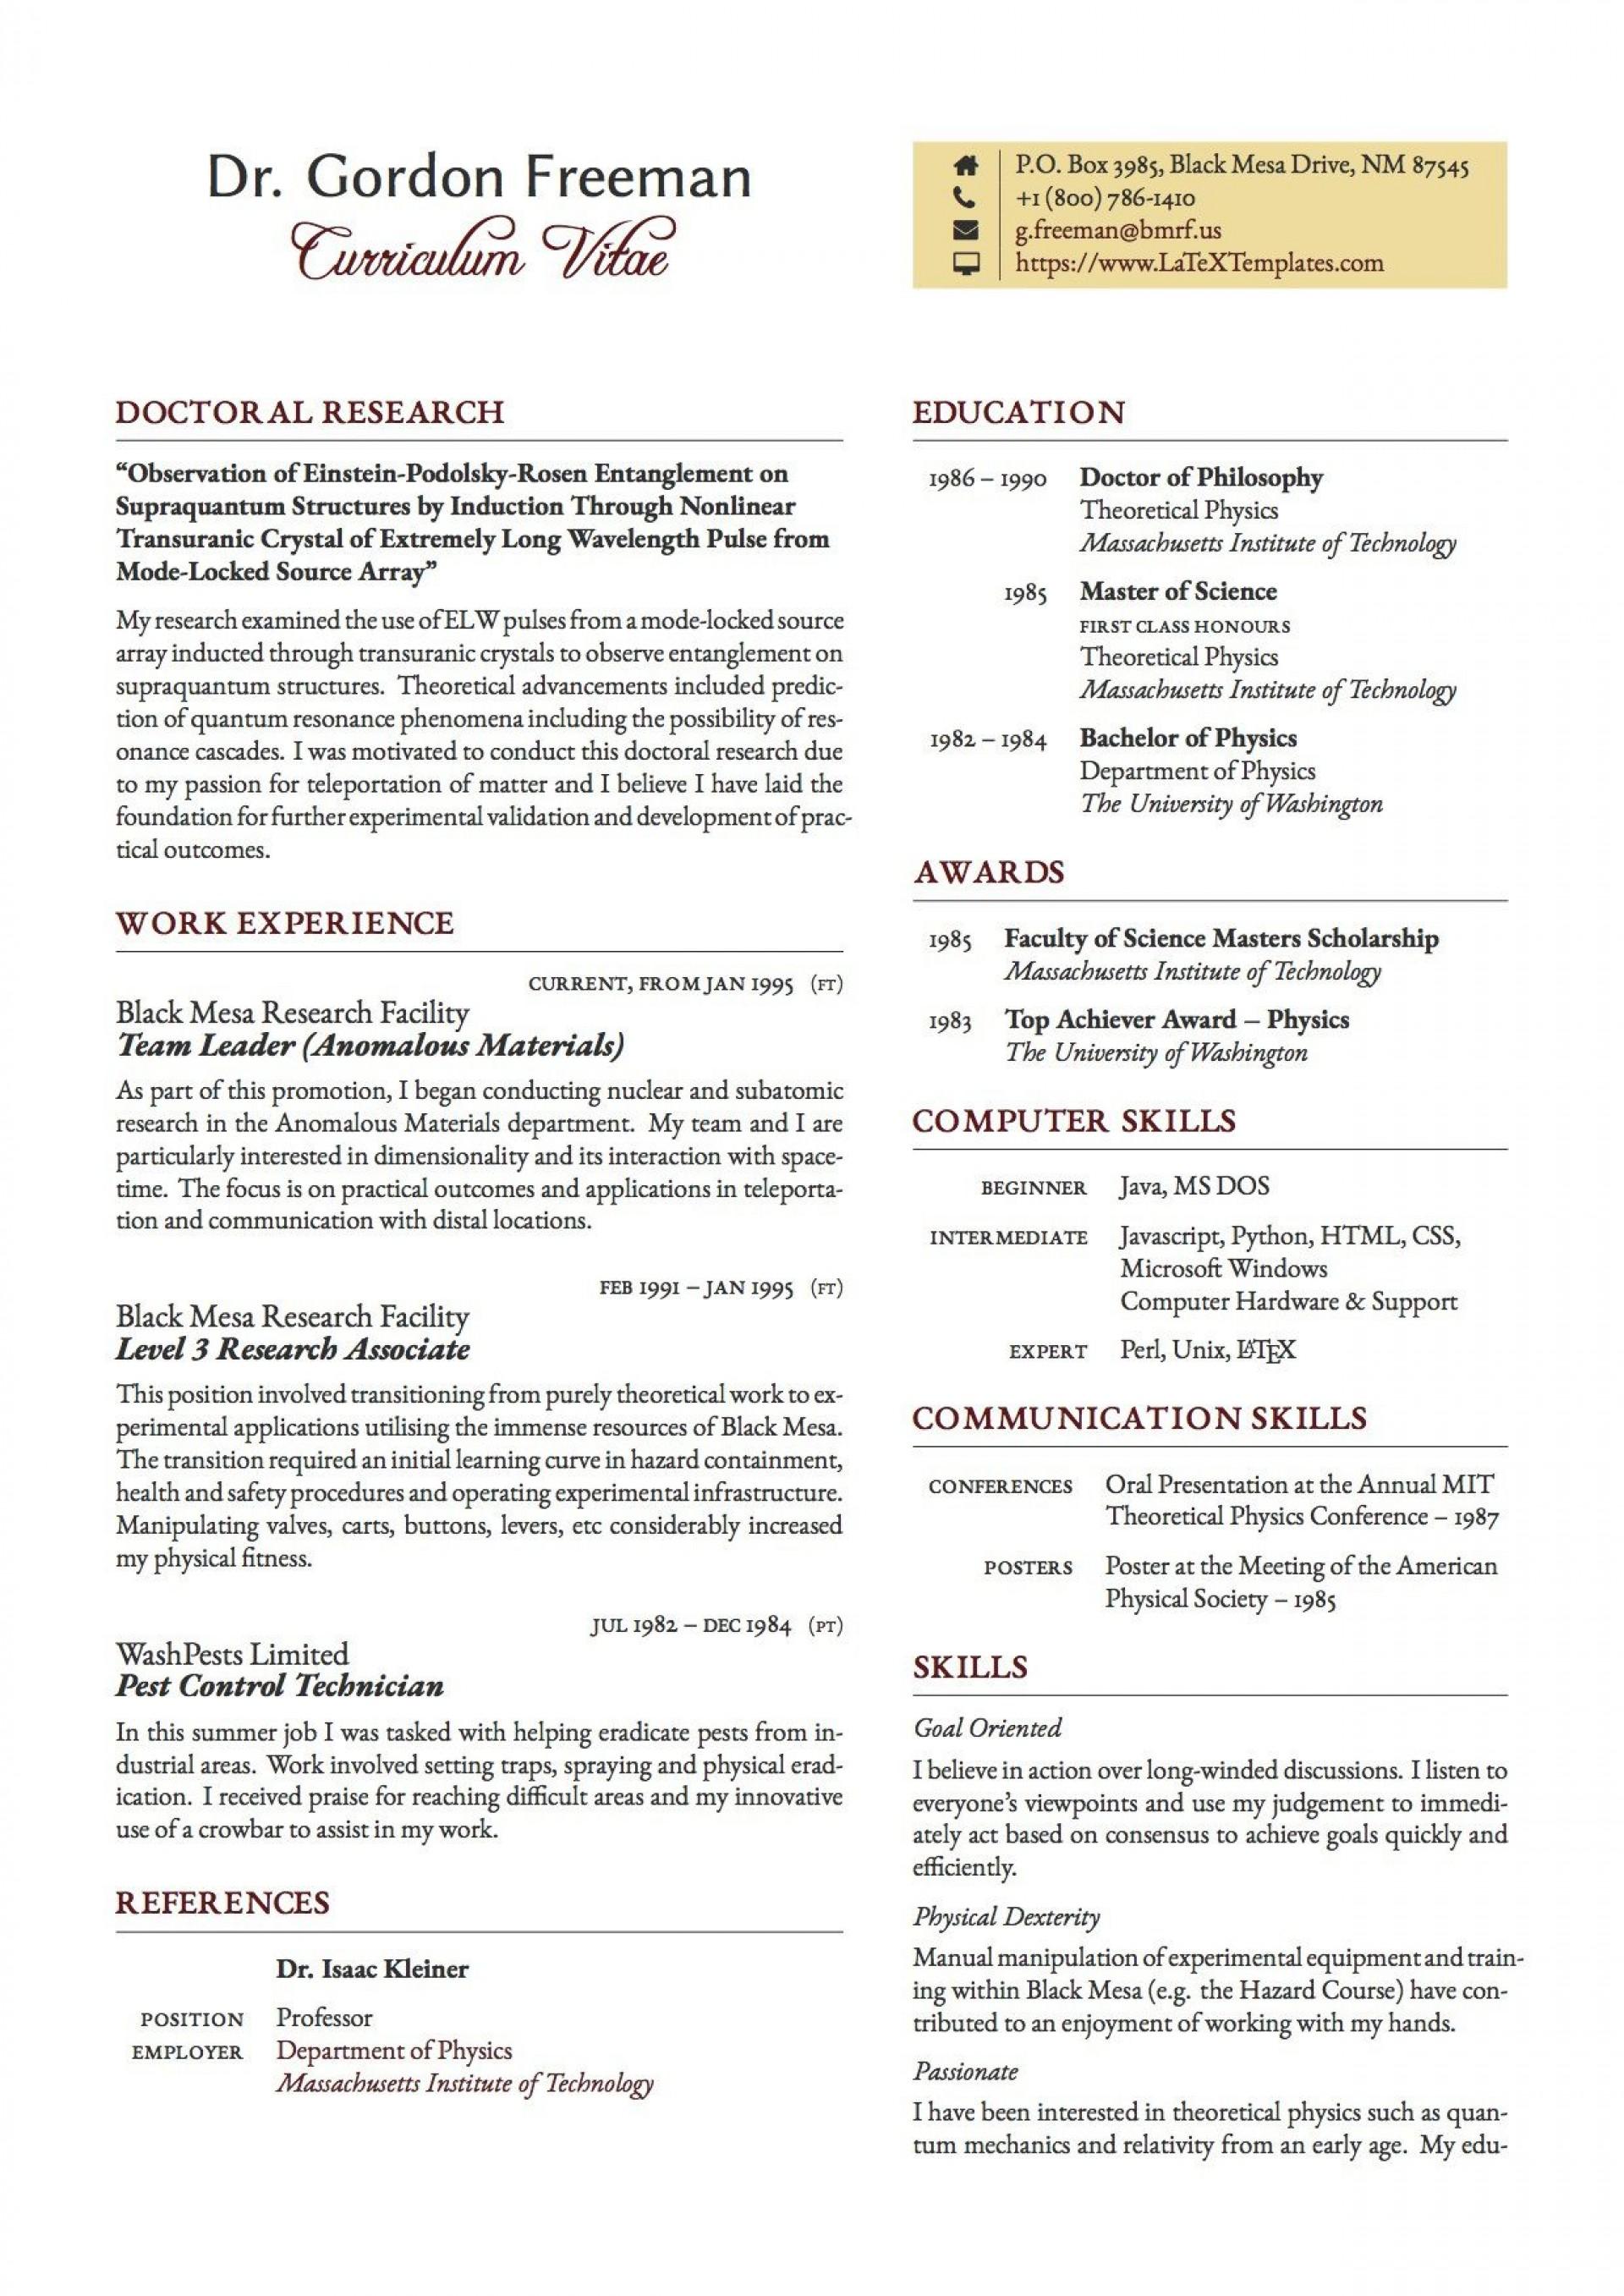 003 Exceptional Latex Resume Template Phd Inspiration  Cv Graduate Student Economic1920